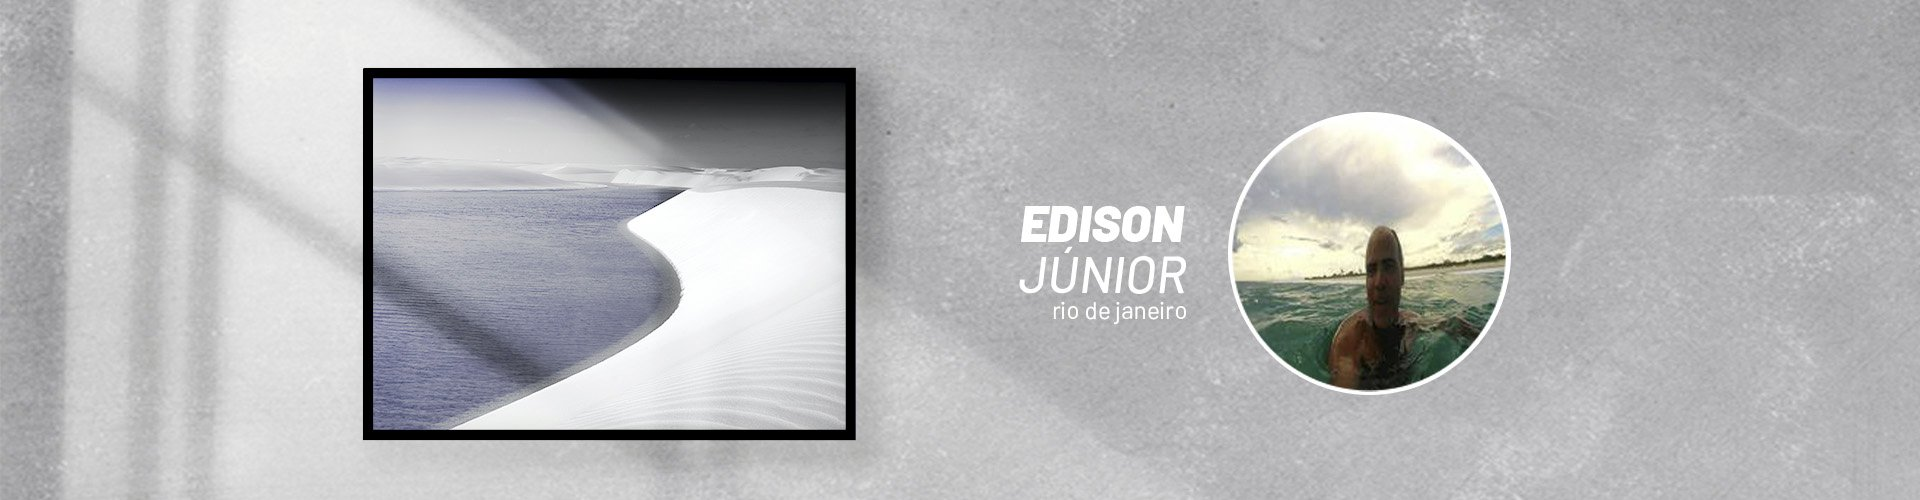 Página Artista | Edison Júnior